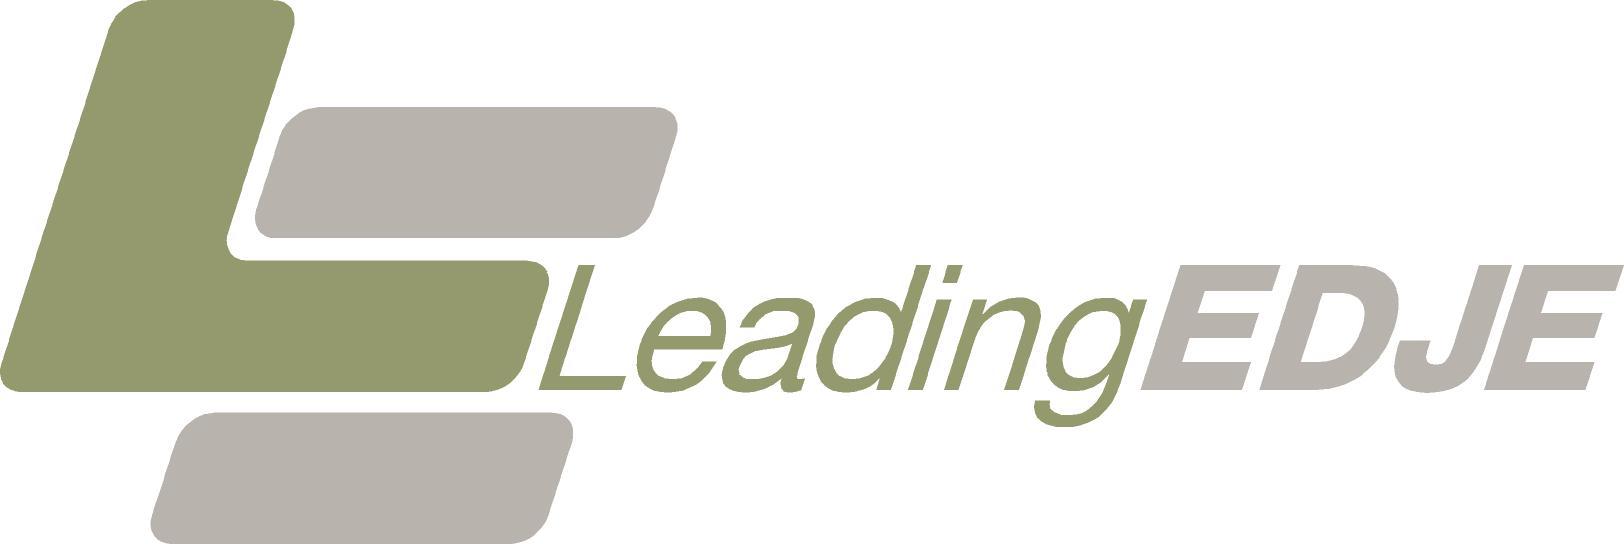 LeadingEdje